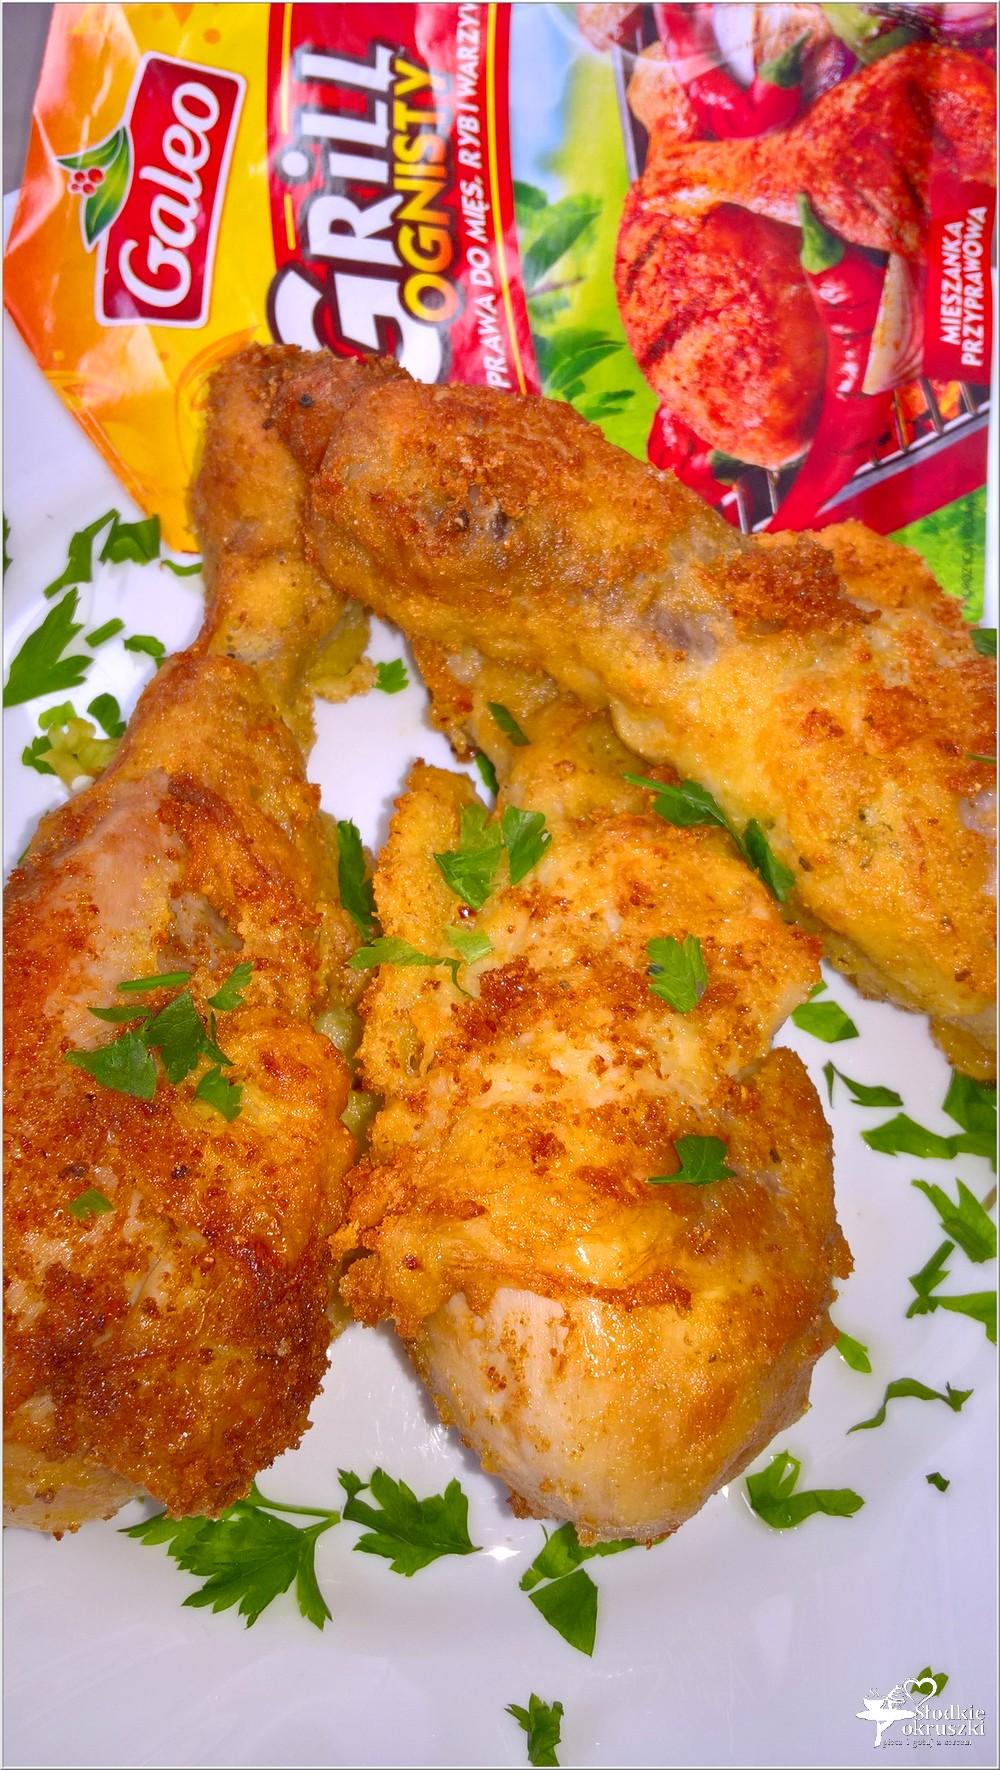 Chrupiący pikantny kurczak (z rosołu) (2)